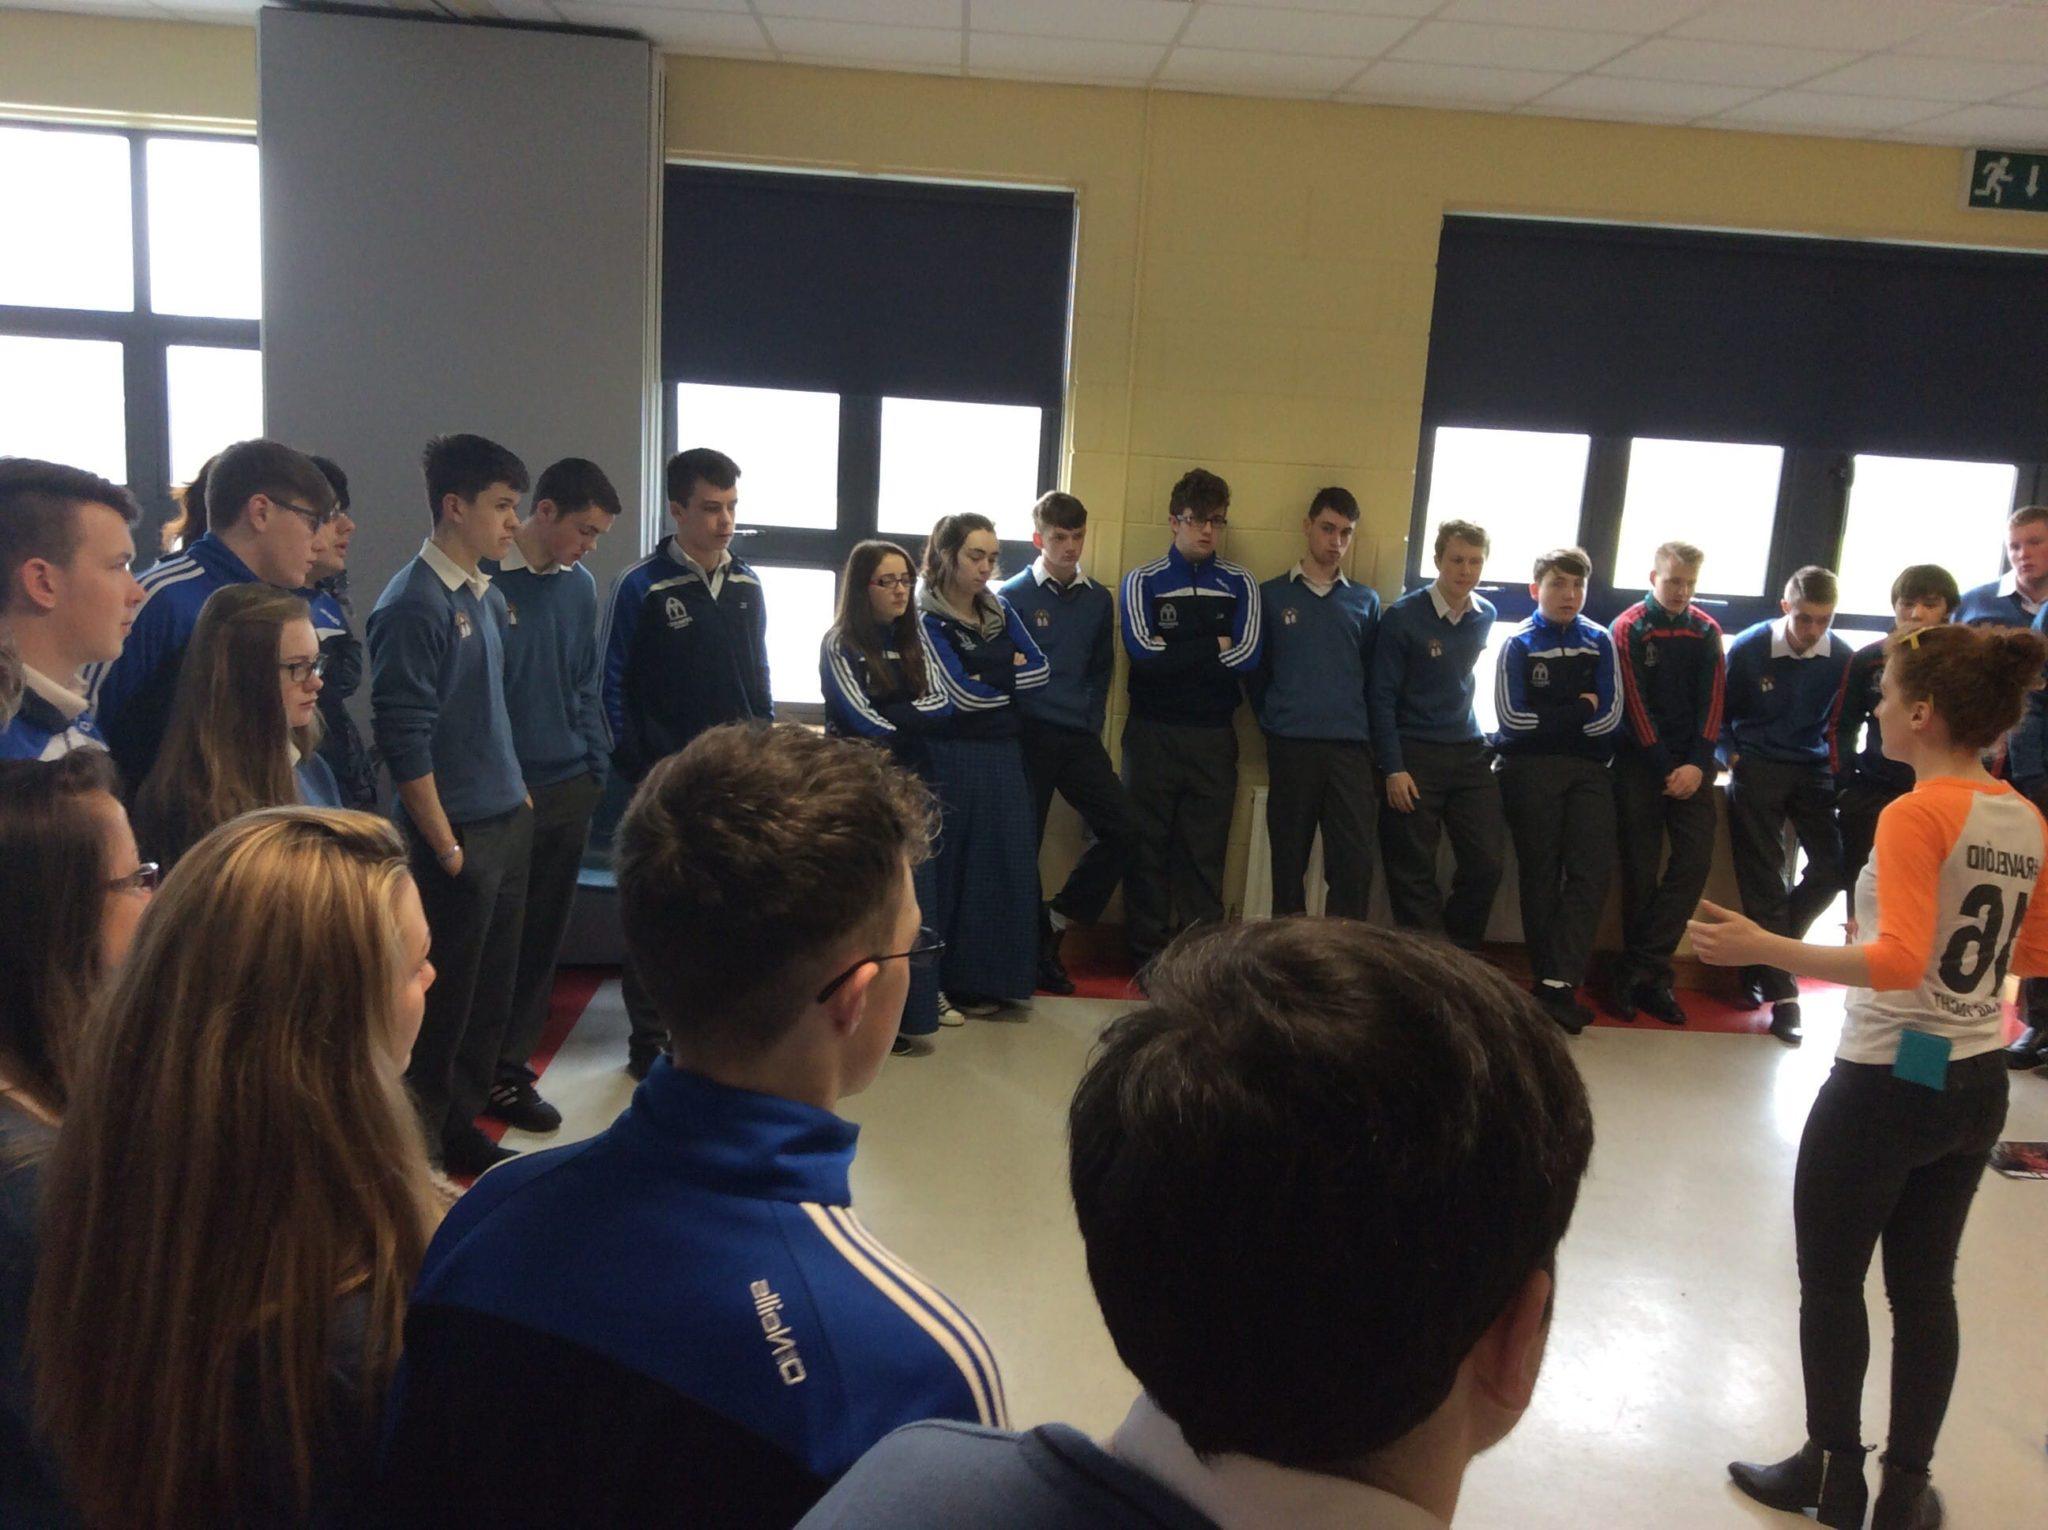 March 2016 Seachtain na Gaeilge in Desmond College